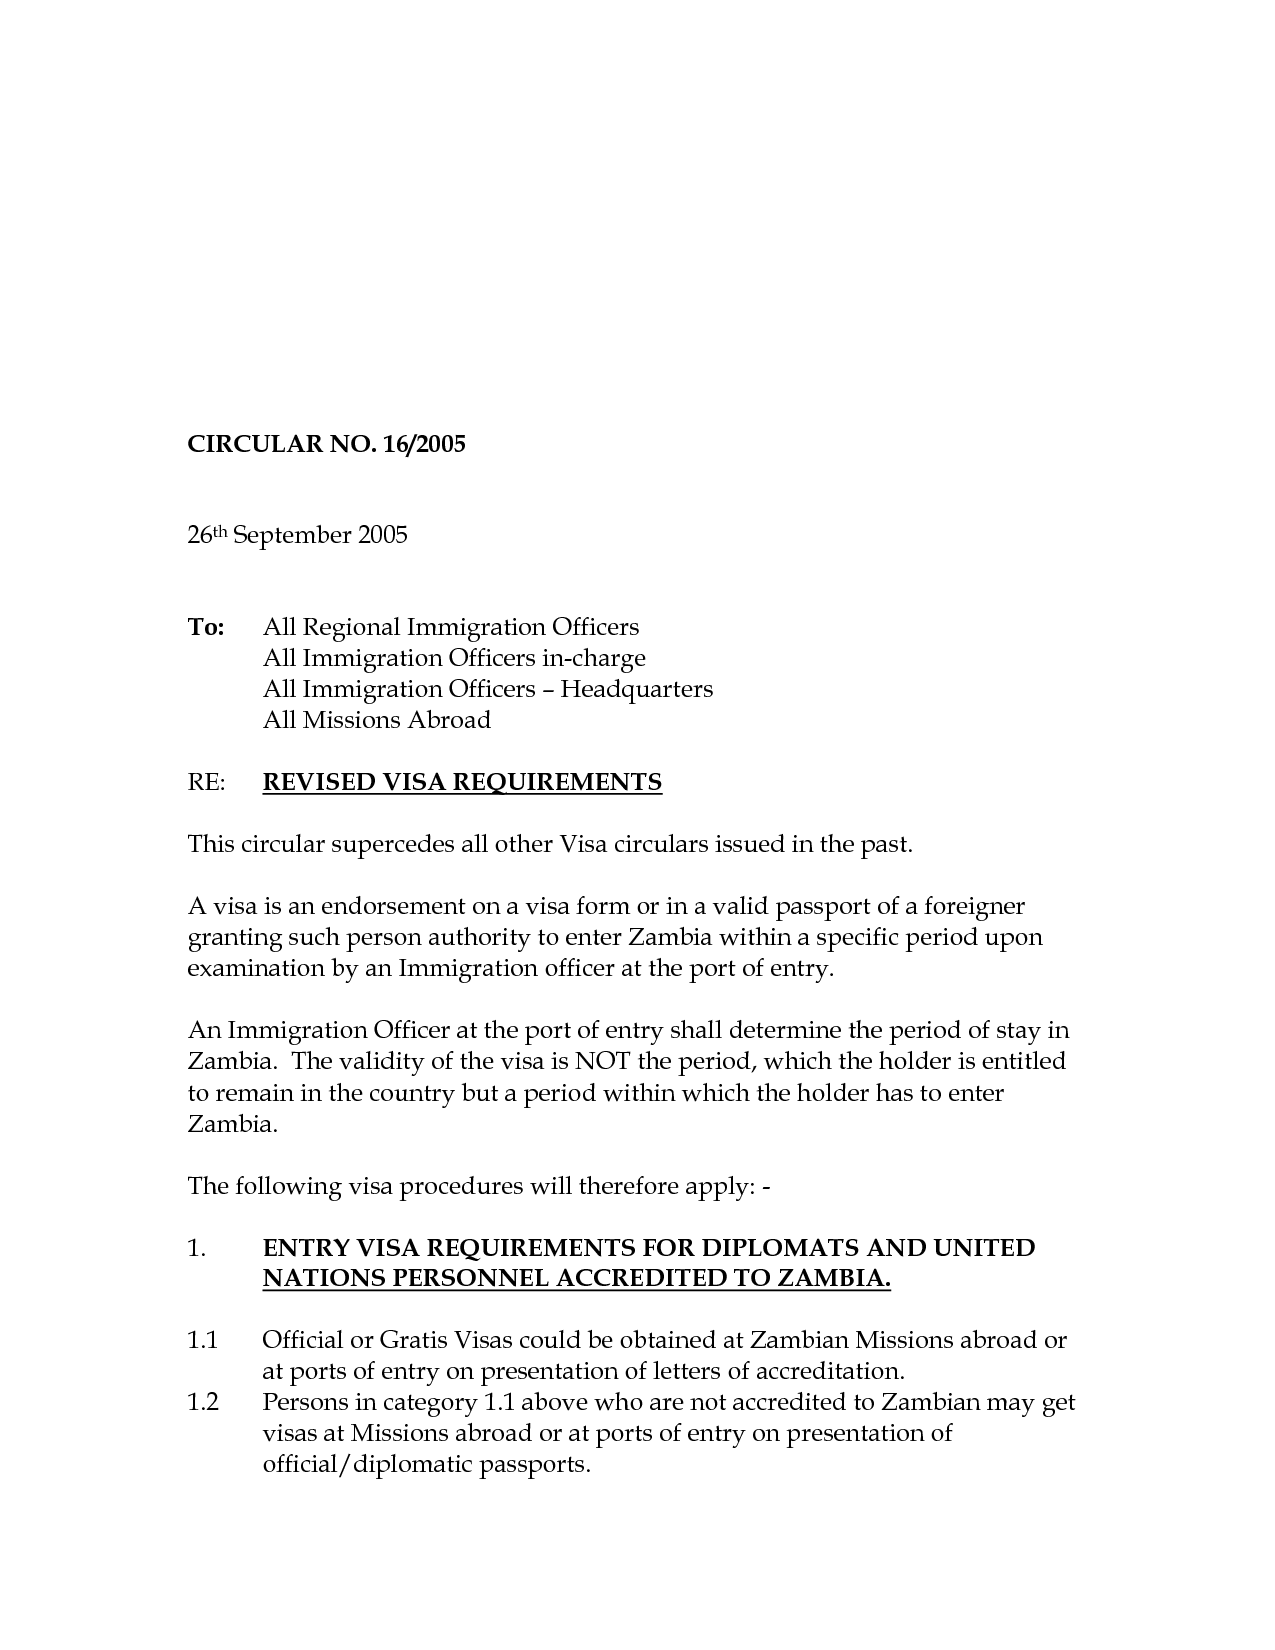 Cover letter work visa application sample letter for work visa extension request cover letter altavistaventures Choice Image